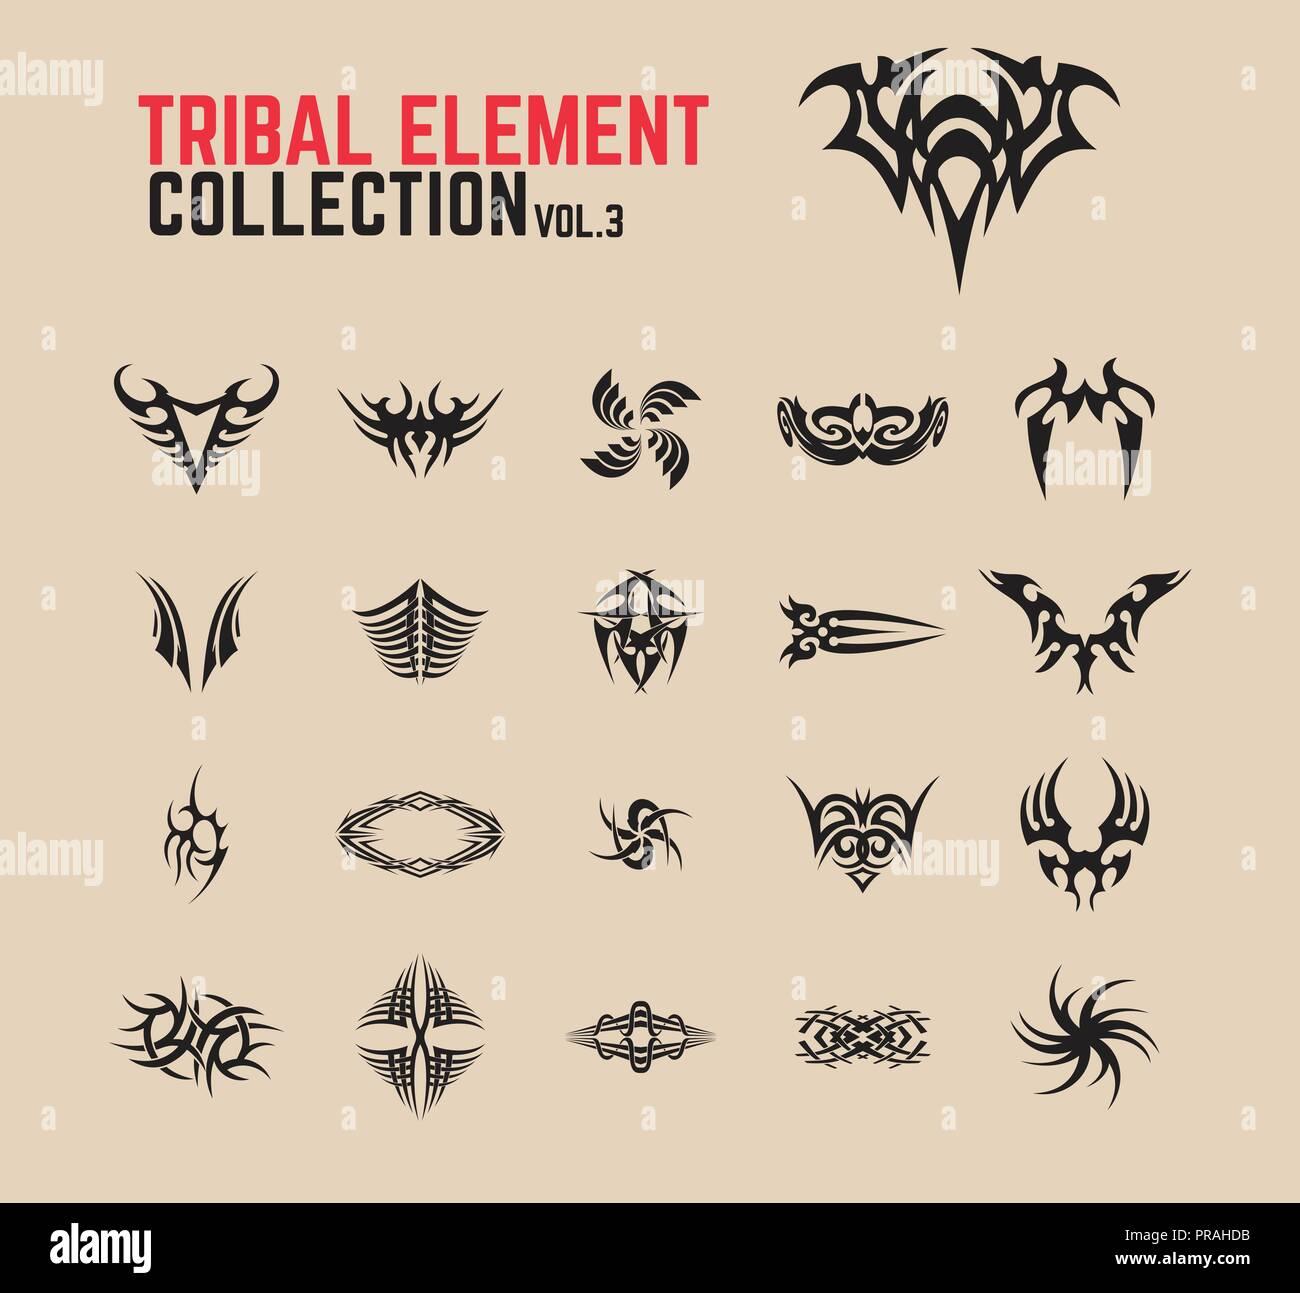 Tribal Tattoo Design Elements Set Stock Vector Art Illustration